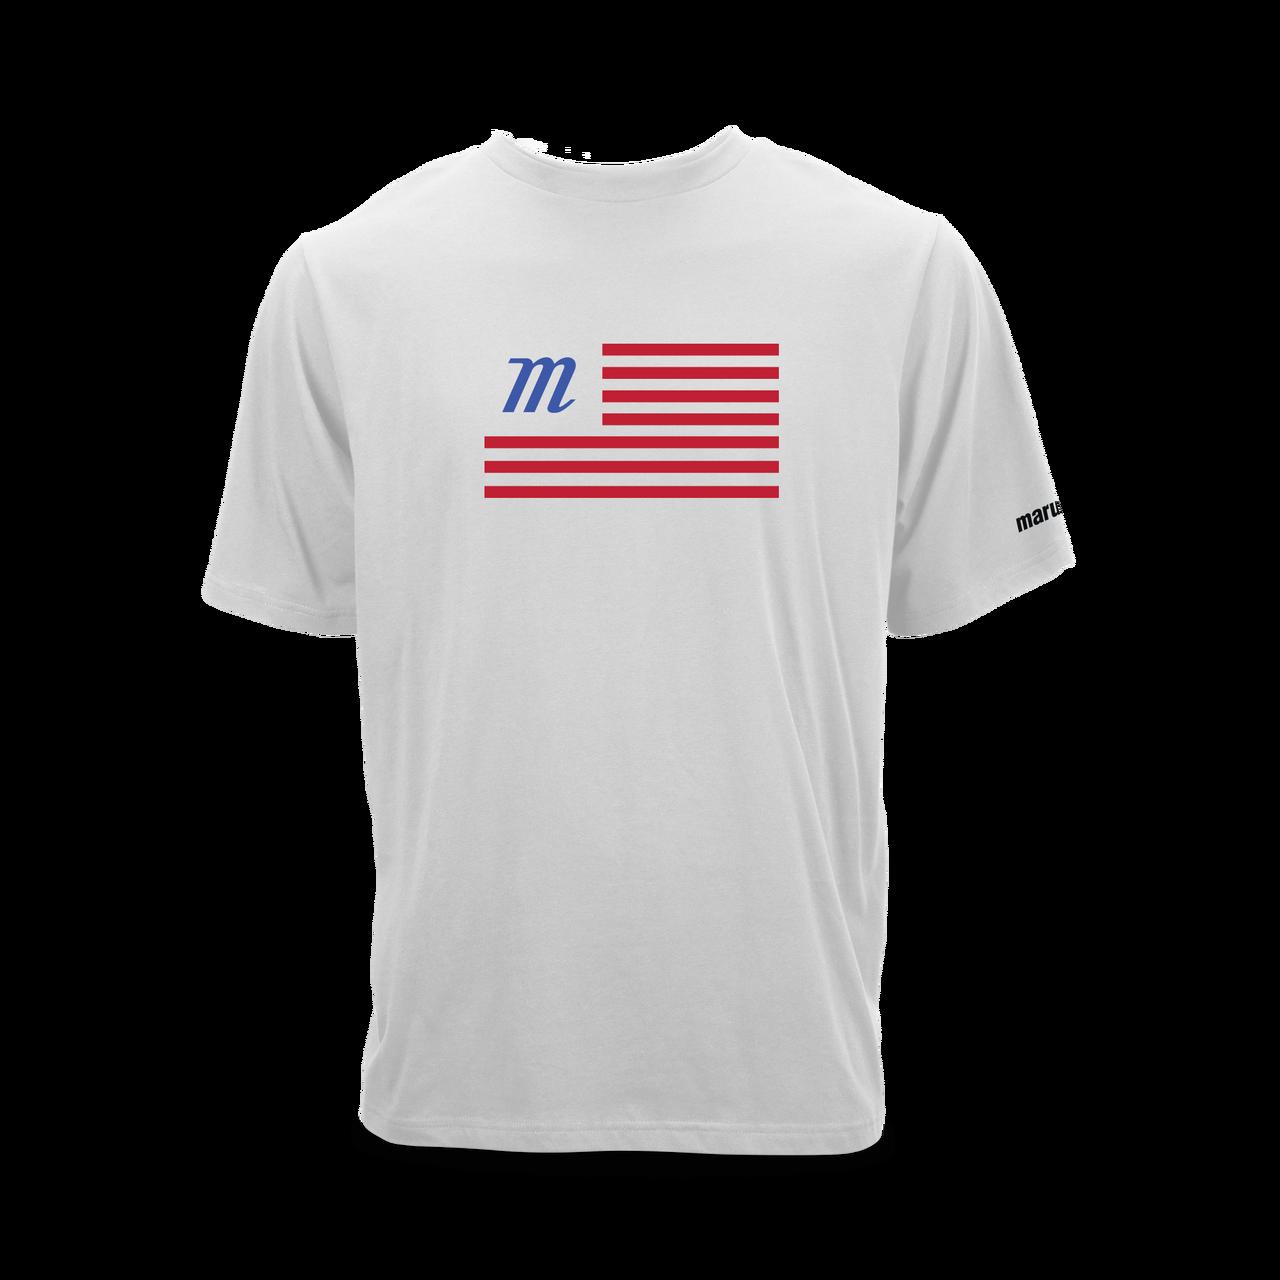 adba33ec5b32 Marucci Flag T-Shirt